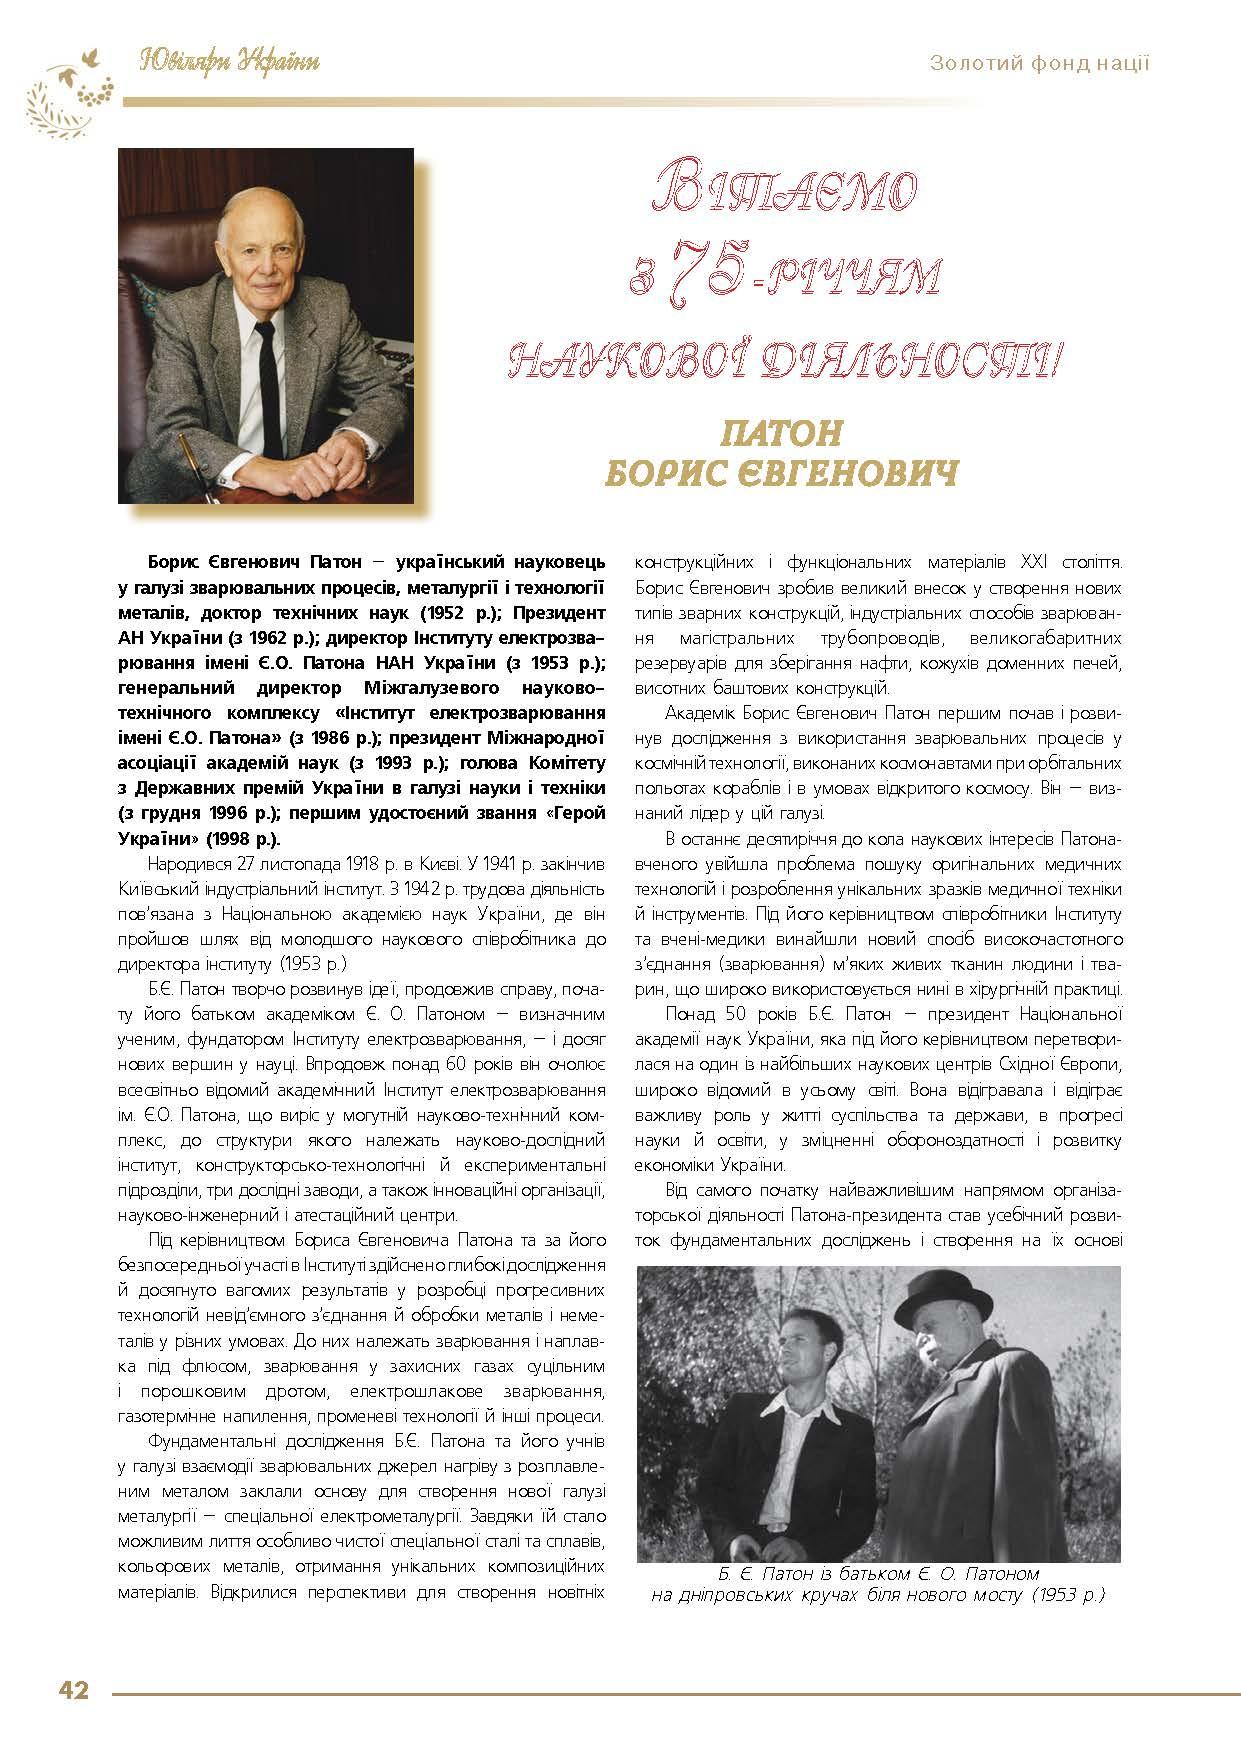 Патон Борис Євгенович